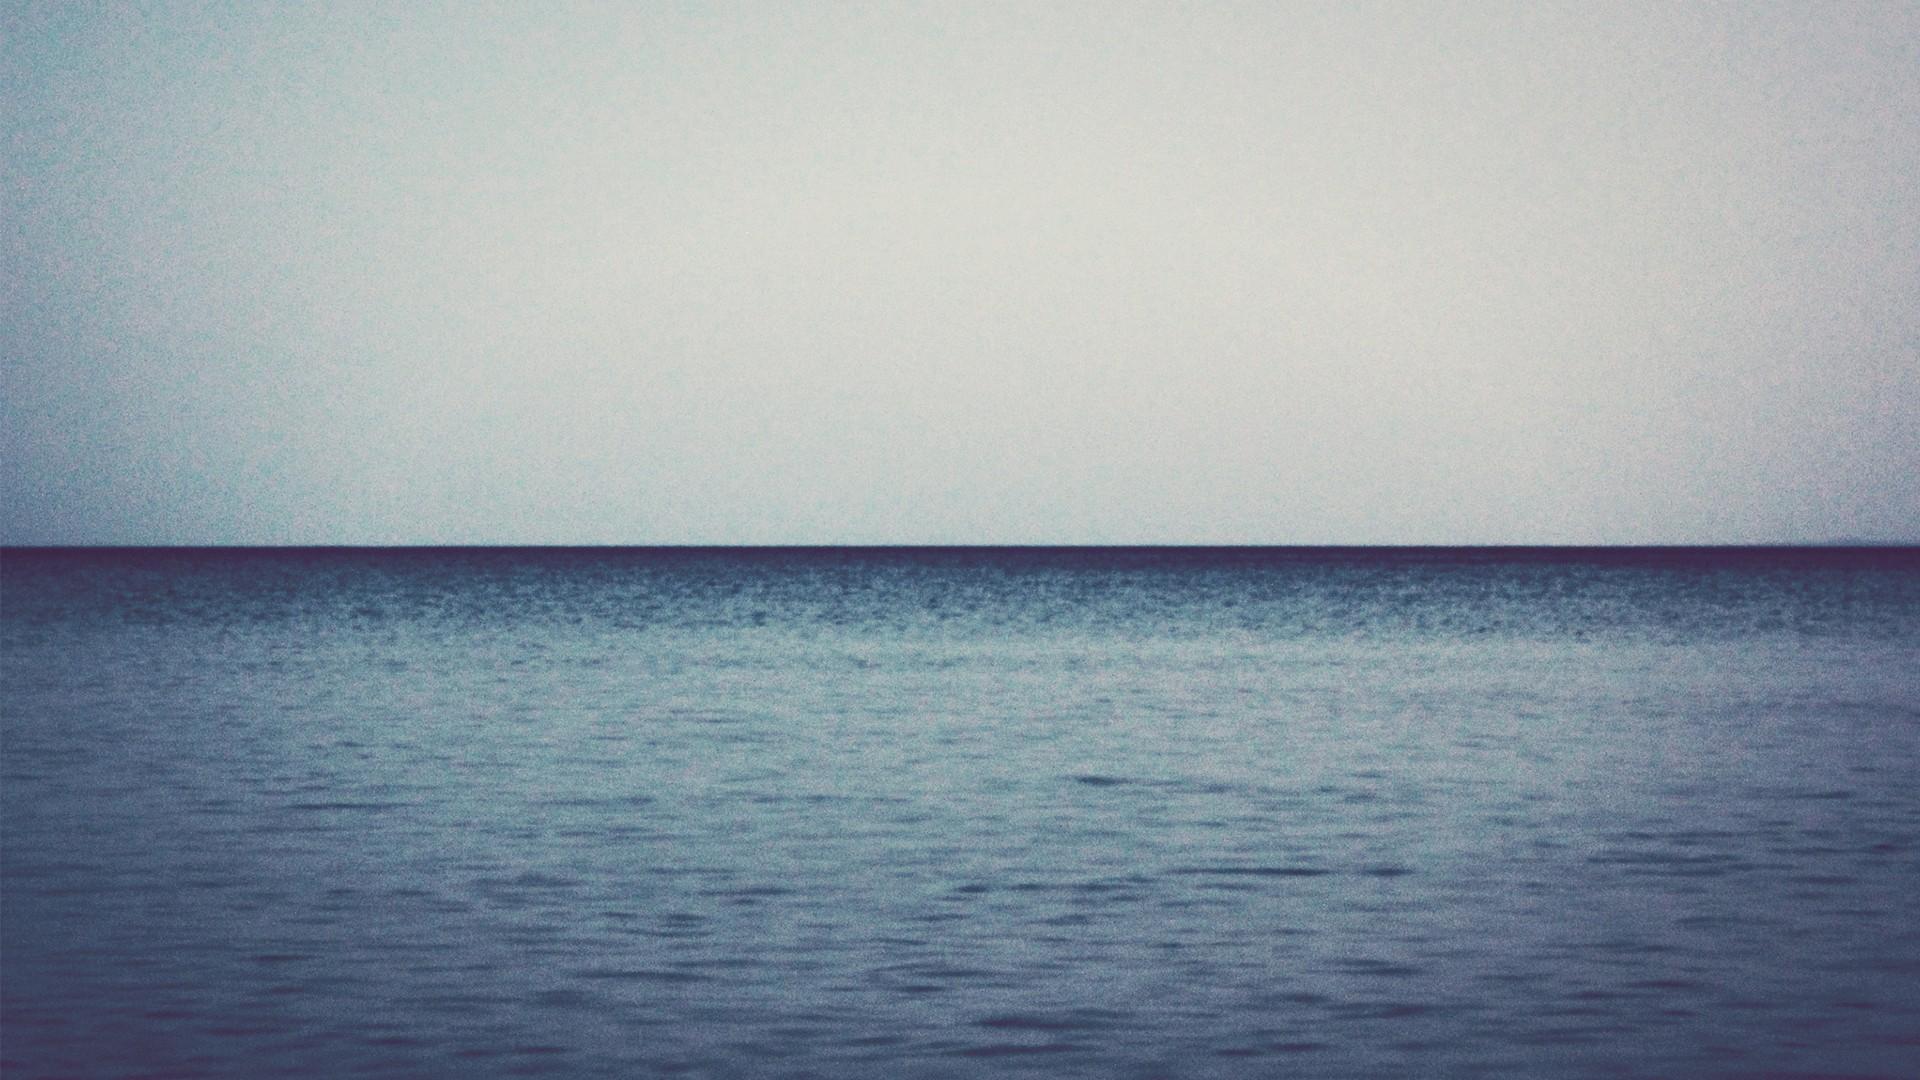 sky sea horizon water